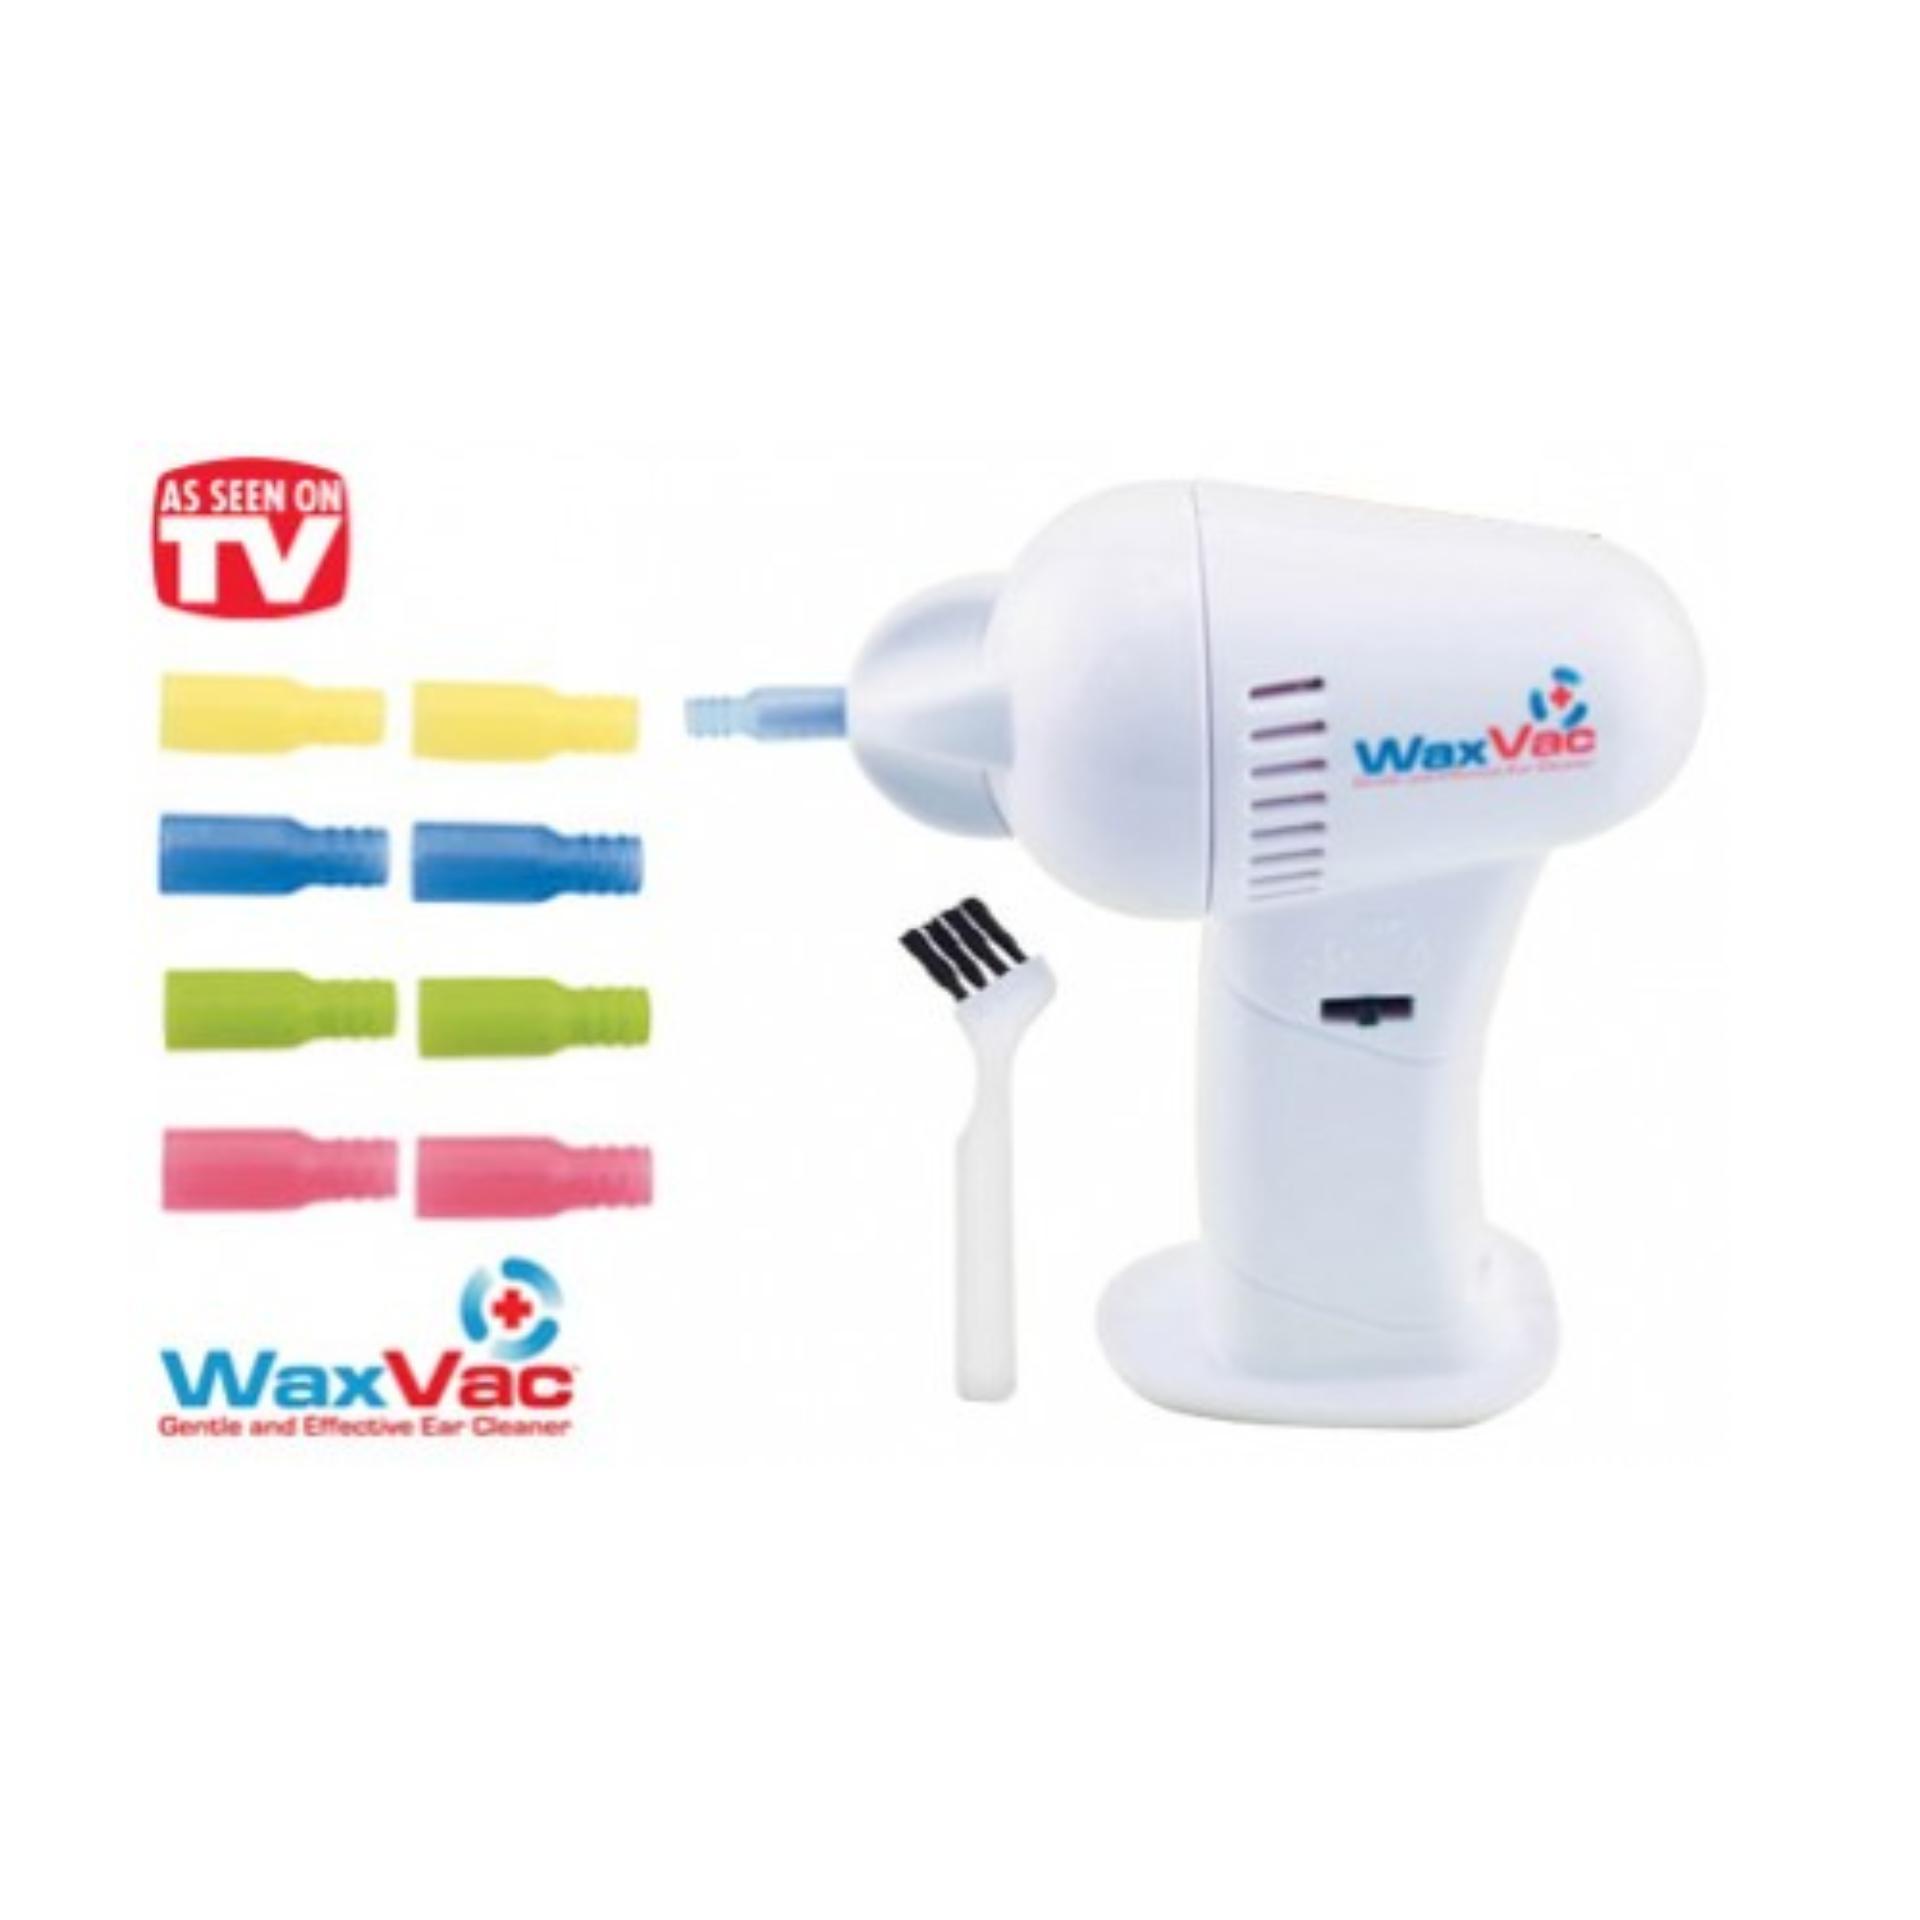 Waxvax Ears Cleaner Vacuum Pembersih Kotoran Telinga Daftar Harga Wax Vac Electric Ear Removal Alat Whit Source As Seen On Tv Waxvac